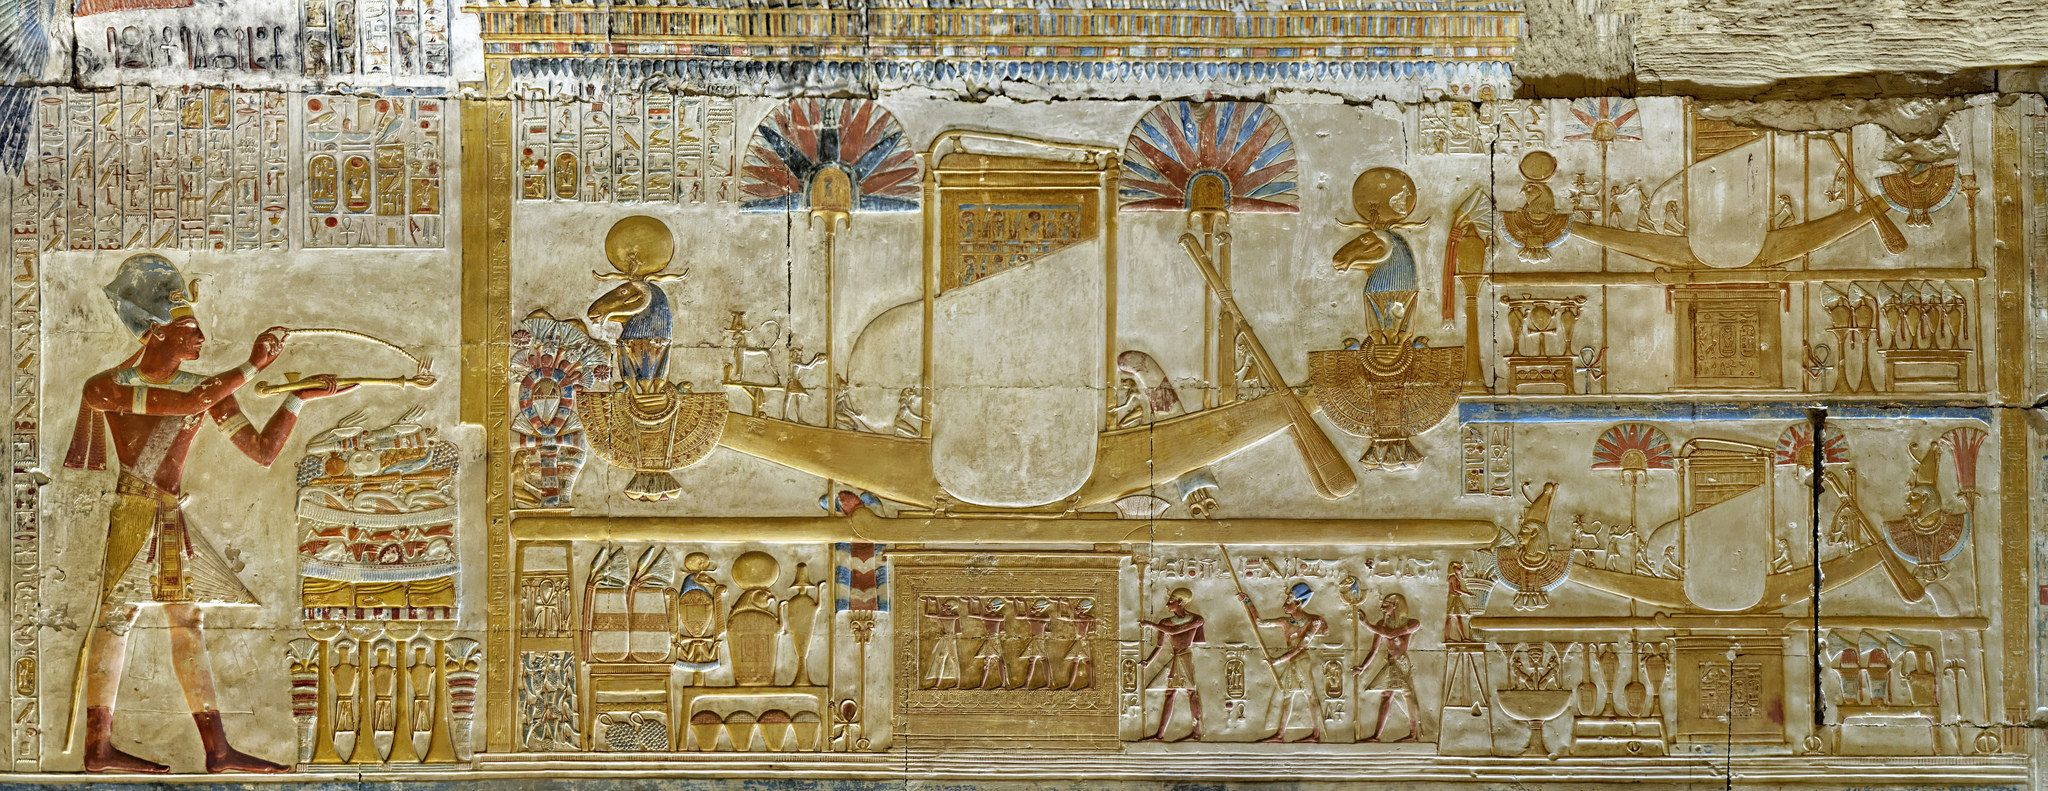 Abydos, Temple of Seti I, Chapel of Amun-Ra, Pano ...